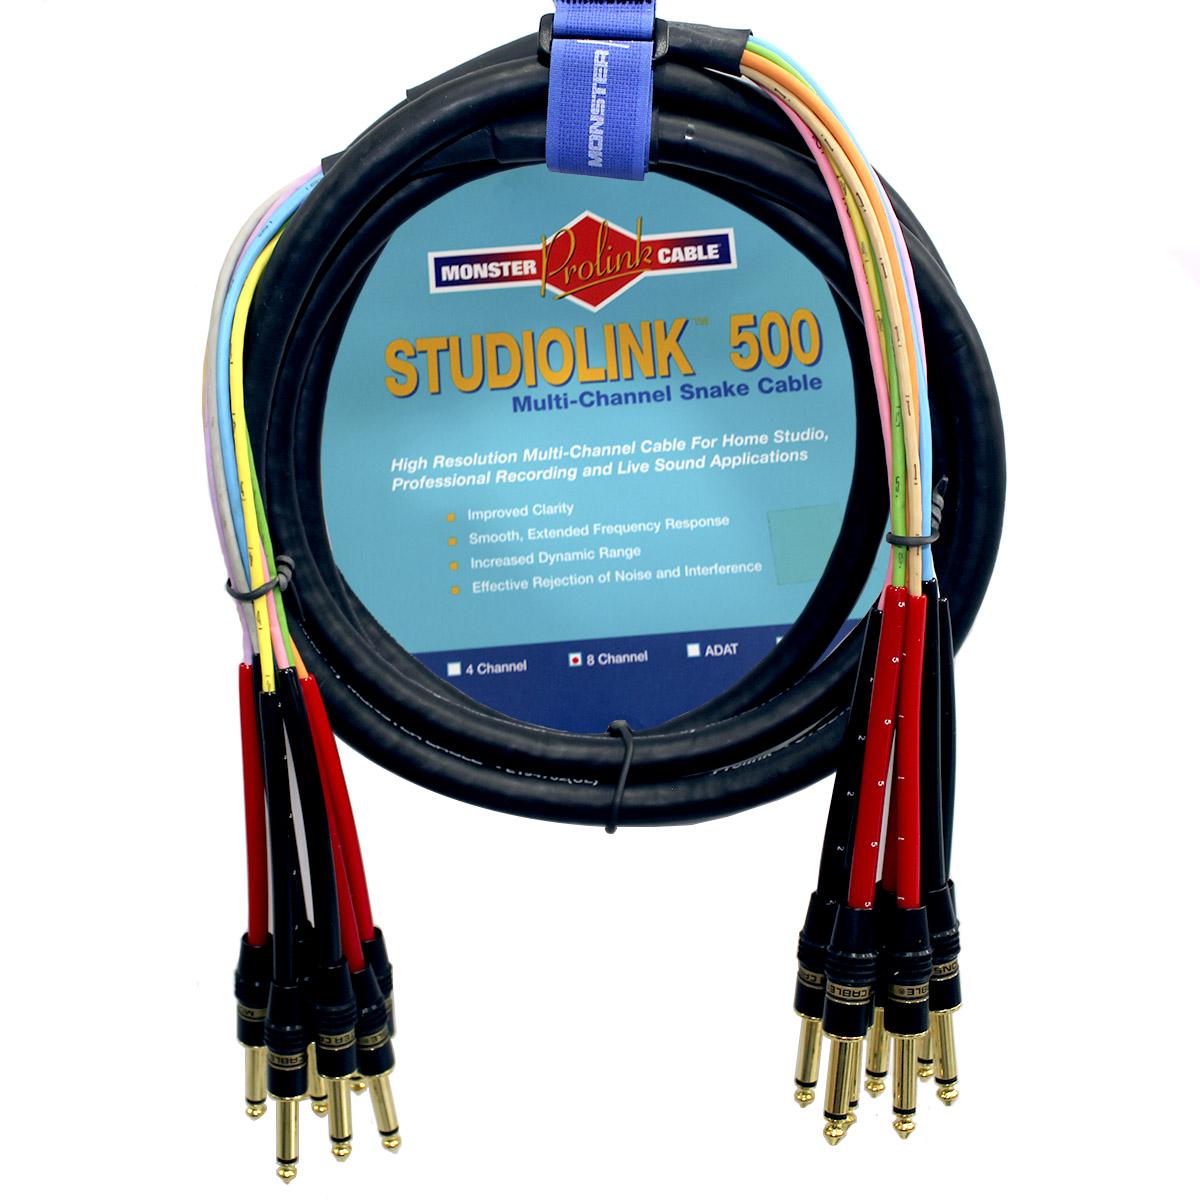 Multicabo 8 vias P10 TS Monster Cable SL500-S8-M-4